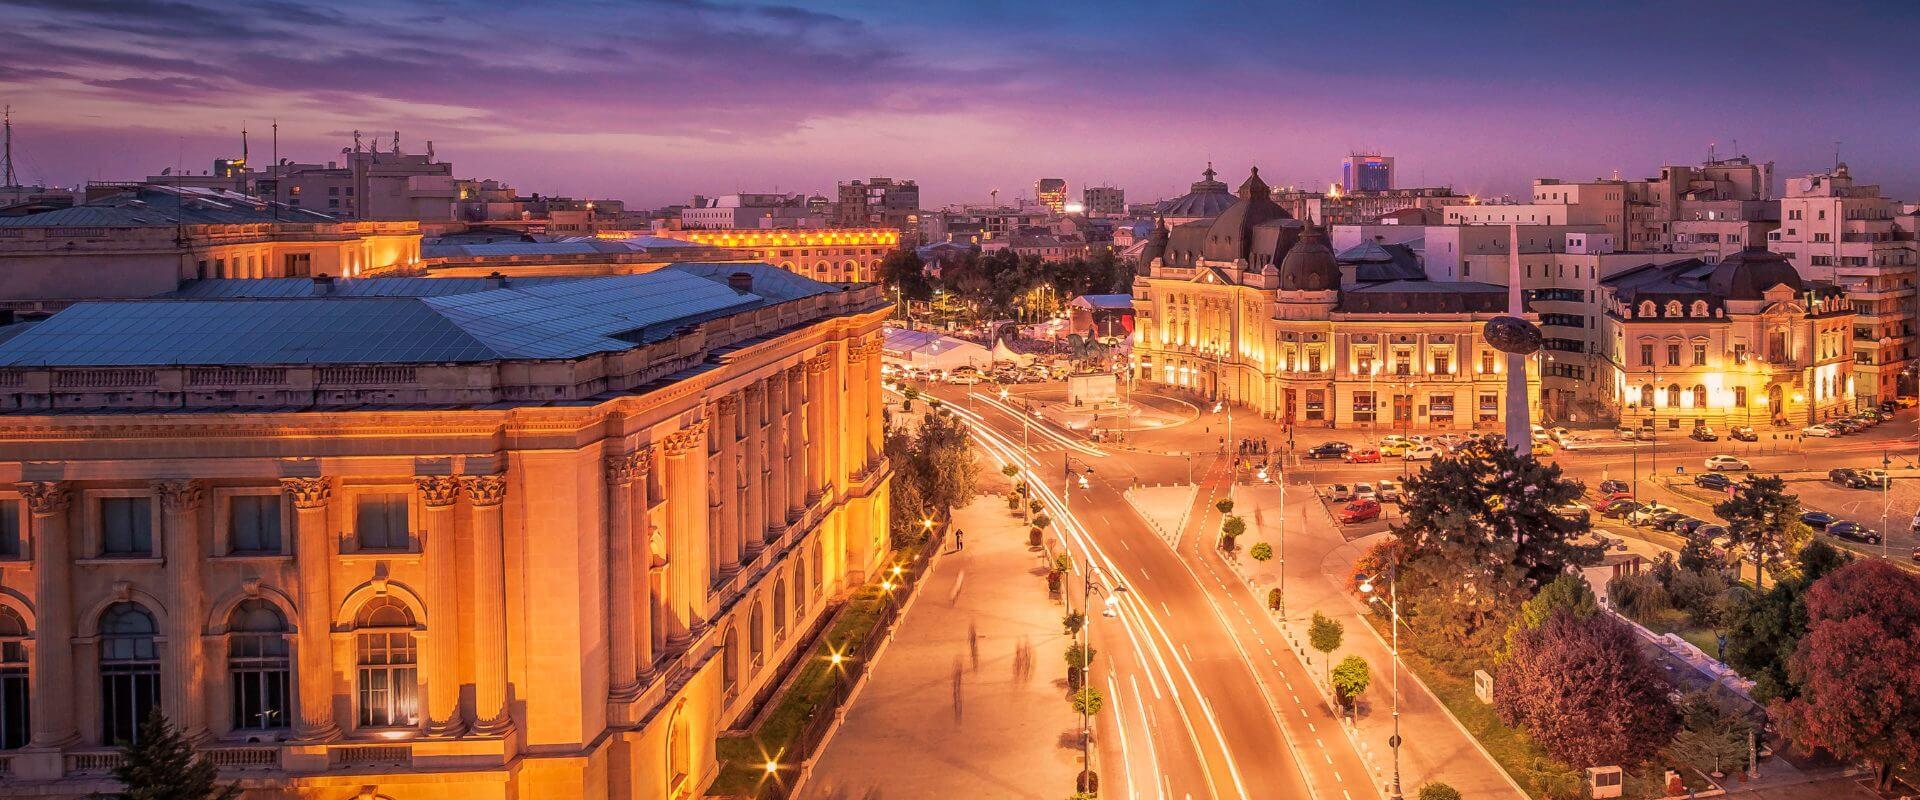 Bild Bukarest